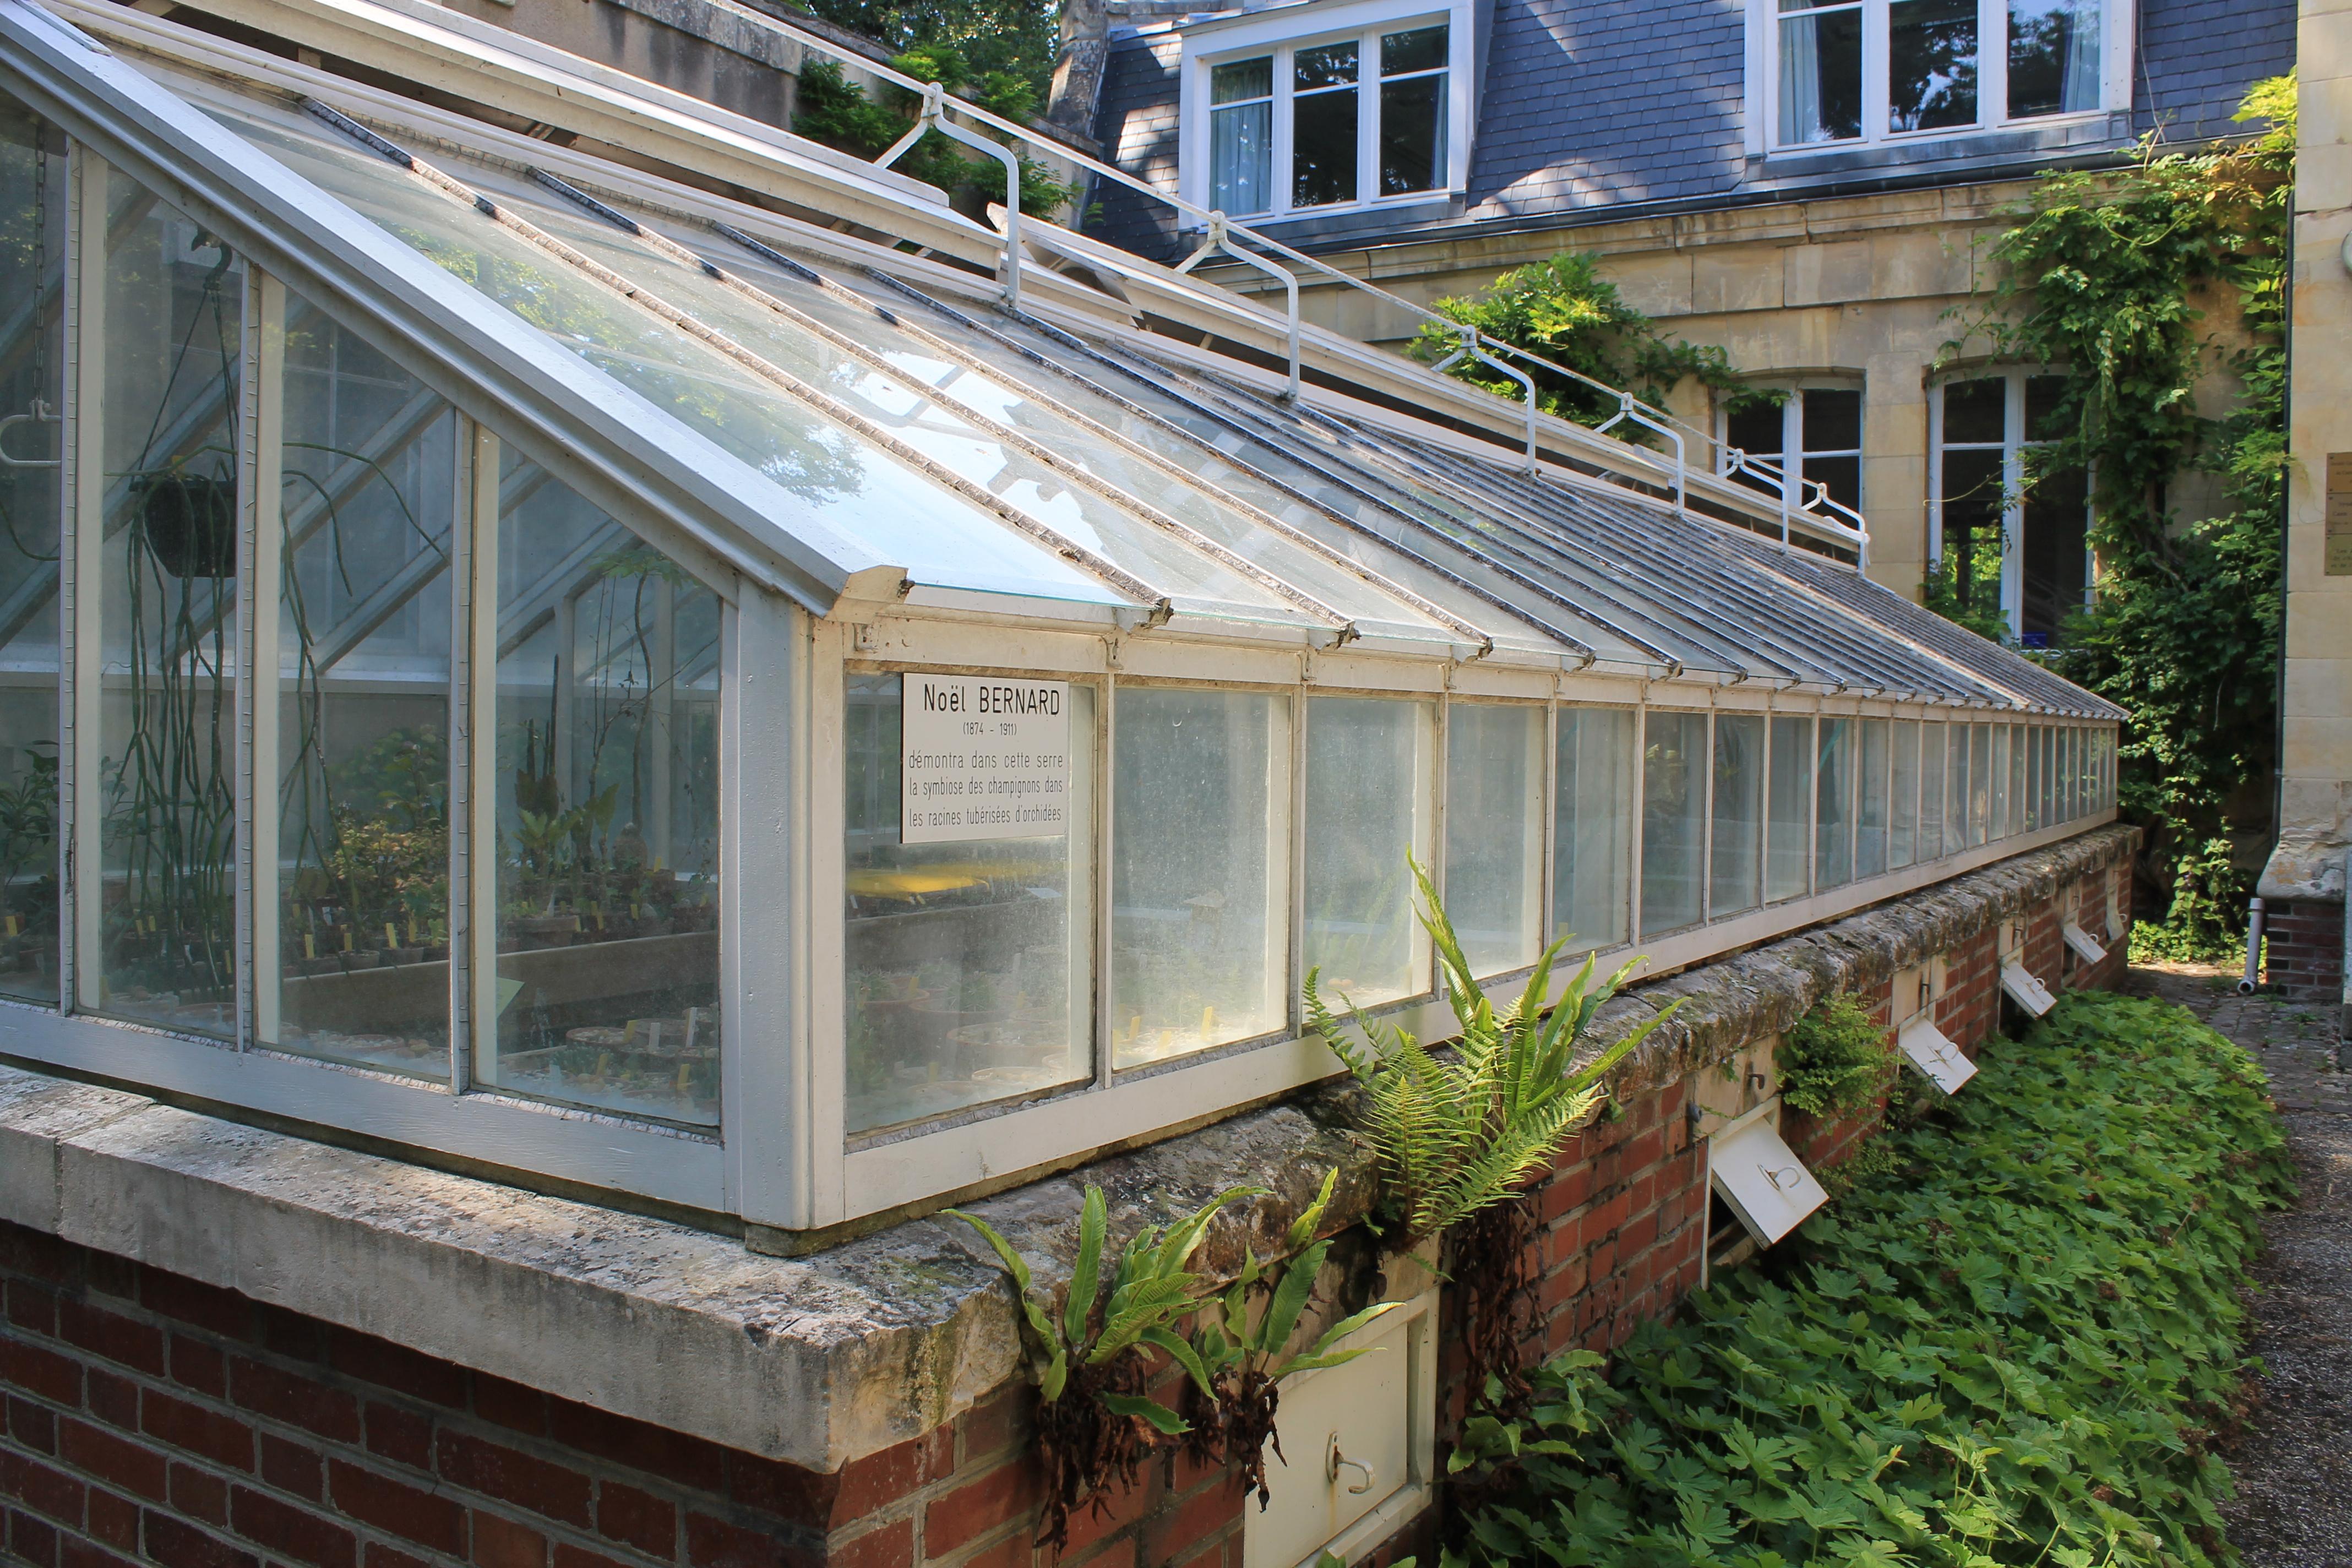 File caen serre institut botanique jpg wikimedia commons - Serre jardin polycarbonate caen ...